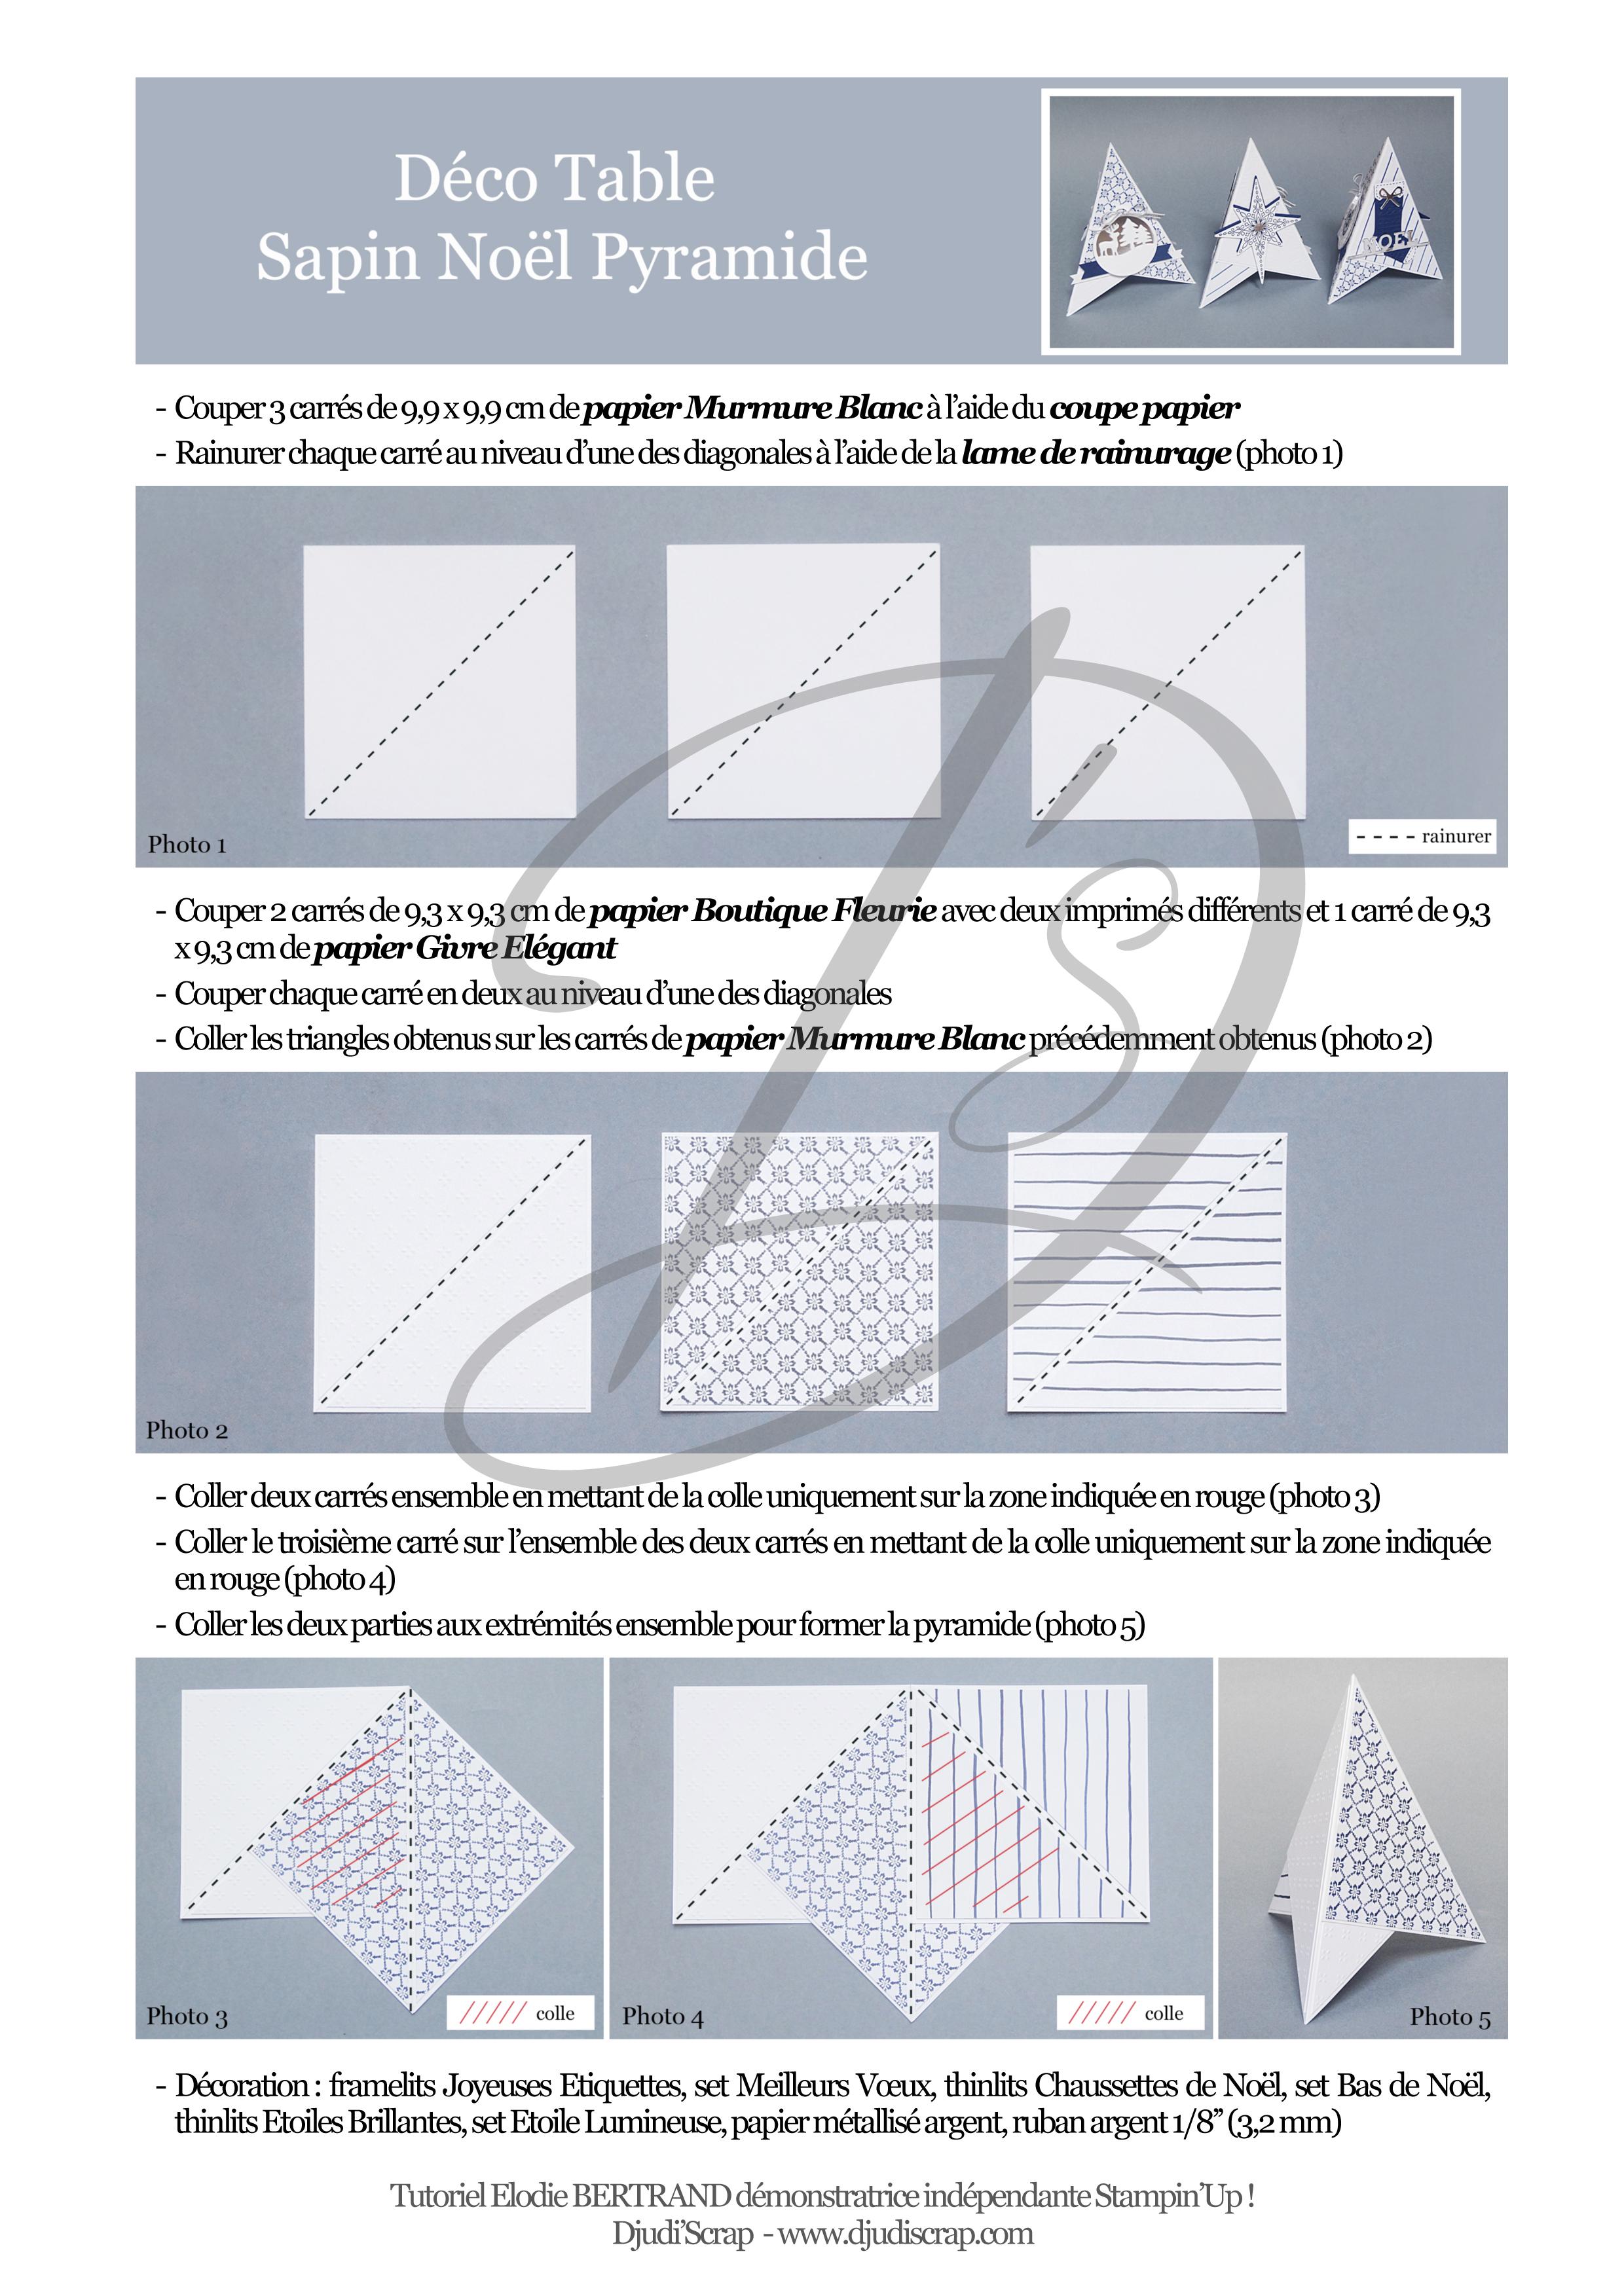 Microsoft Word - DŽco Table Sapin Nol.doc